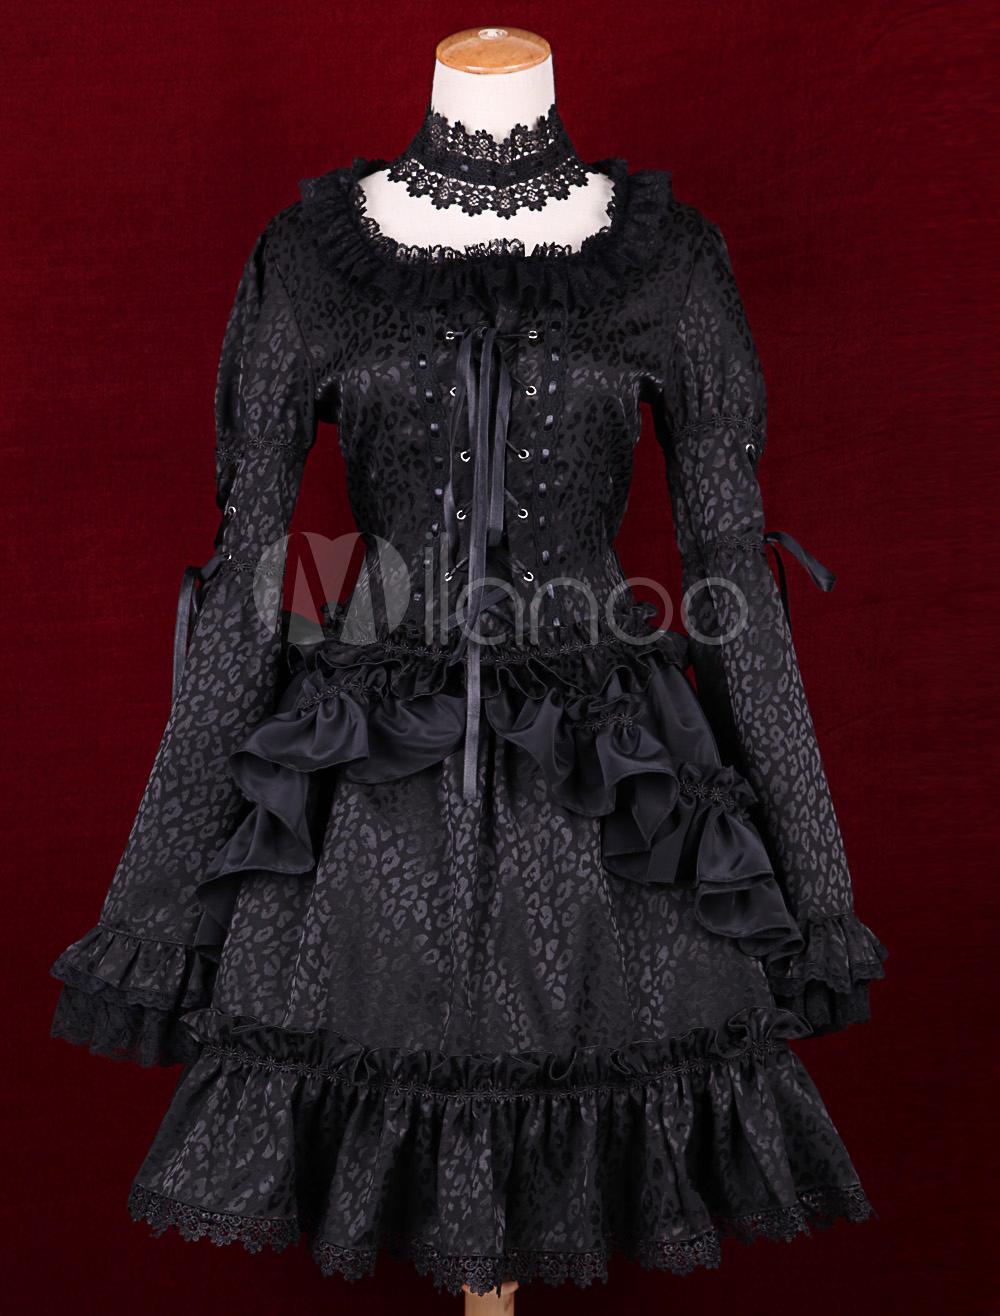 Buy Black Satin Square Neck Long Sleeves Ruffles Gothic Lolita Dress for $80.99 in Milanoo store